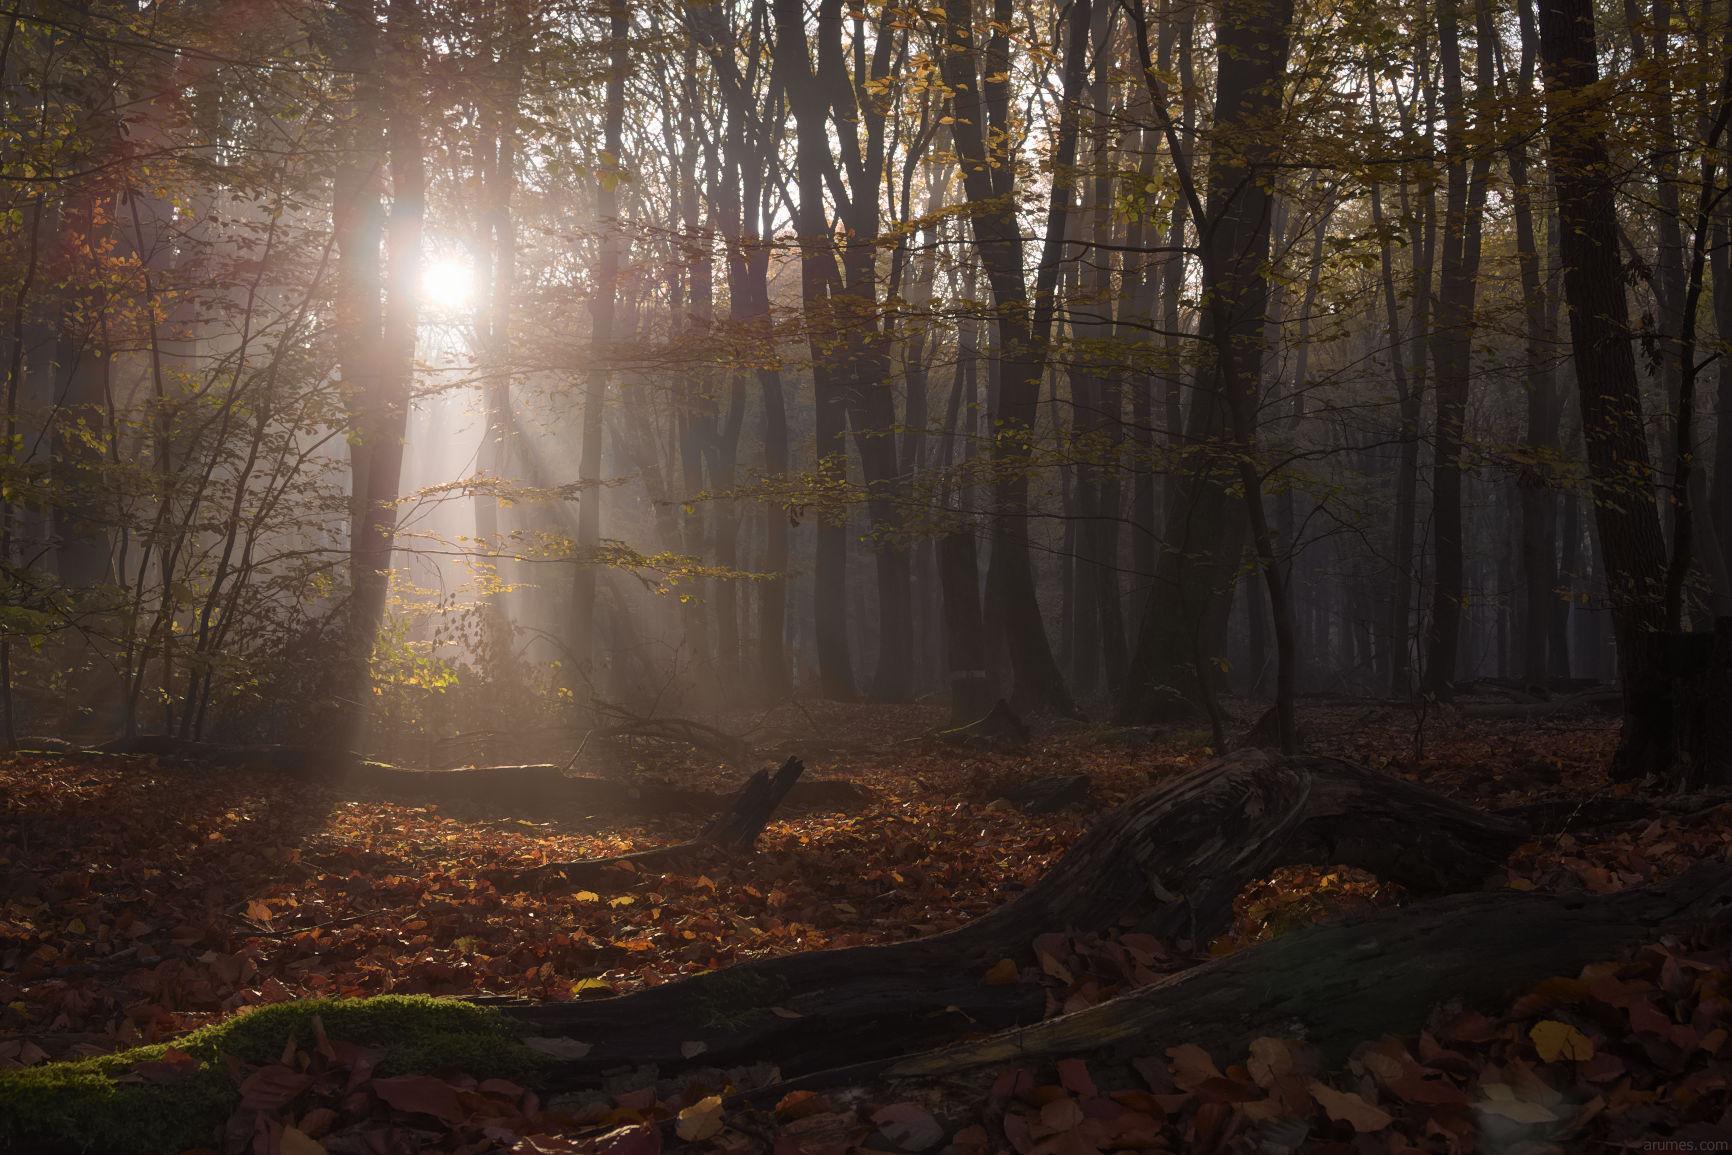 autumn deciduous woods with sunrise rays in haze